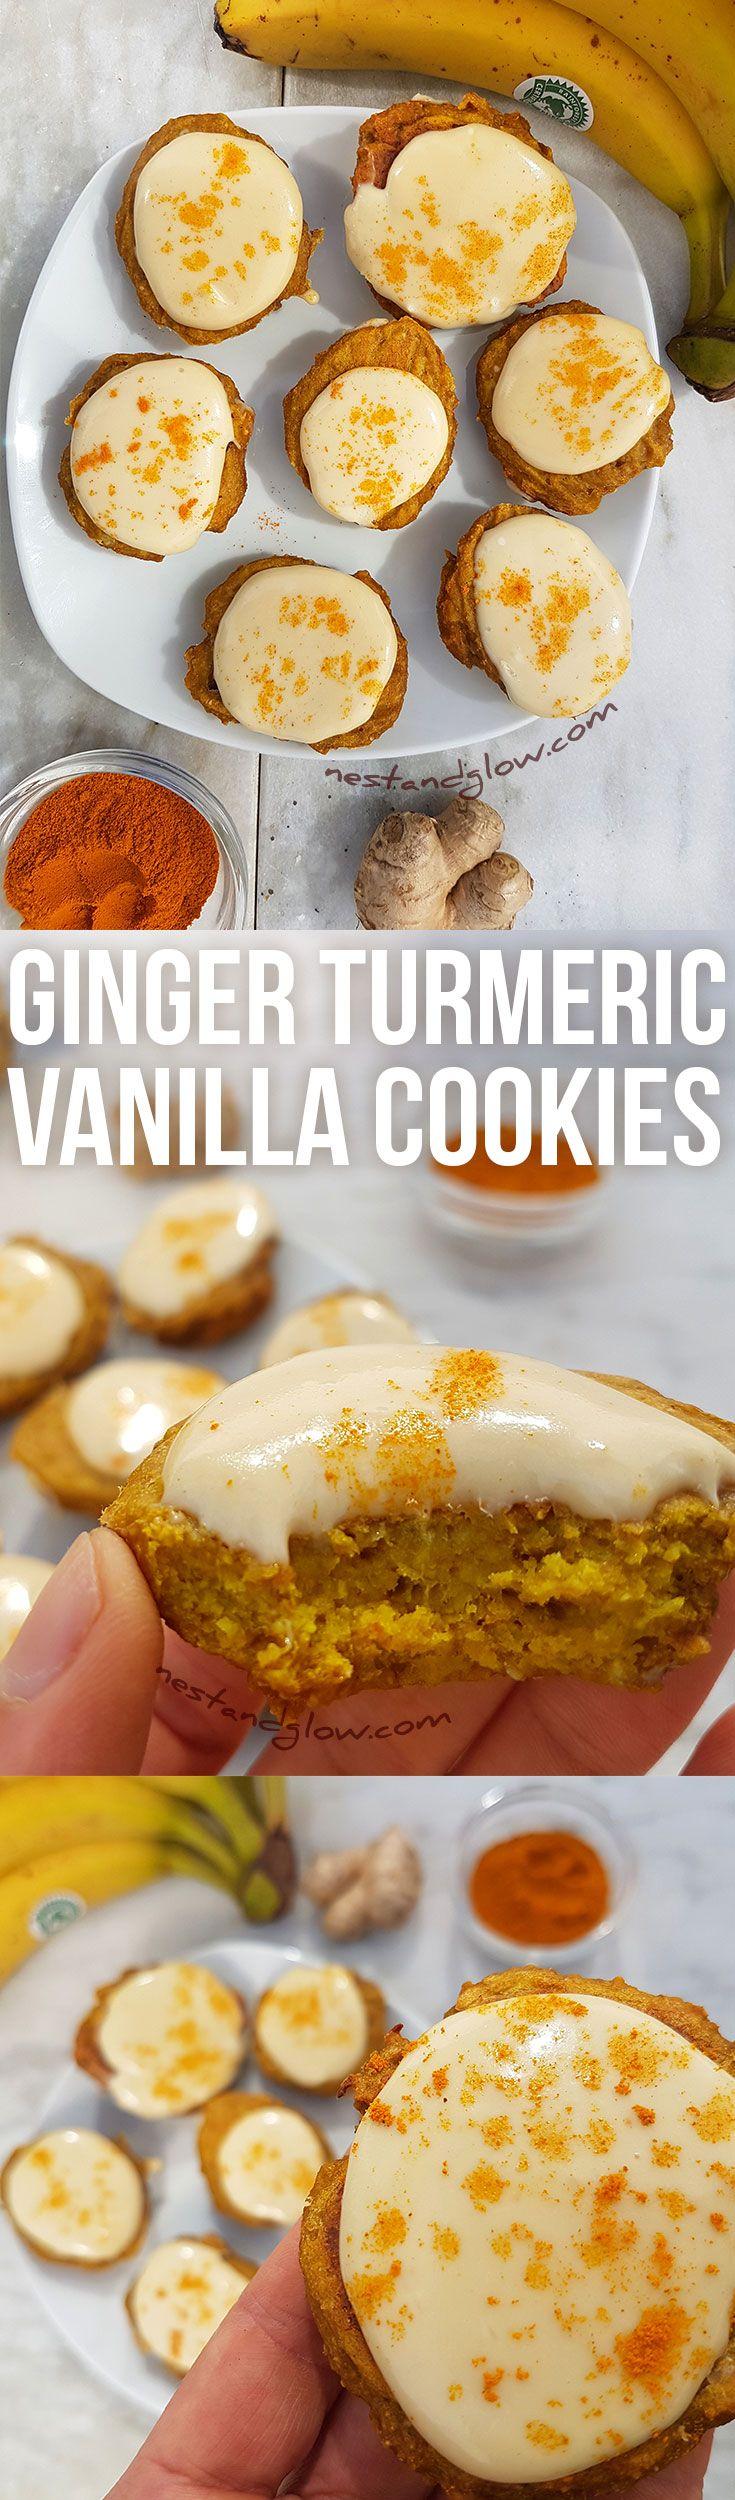 Ginger Turmeric Cashew Vanilla Cookies - Vegan and low sugar plant-based recipe via @nestandglow